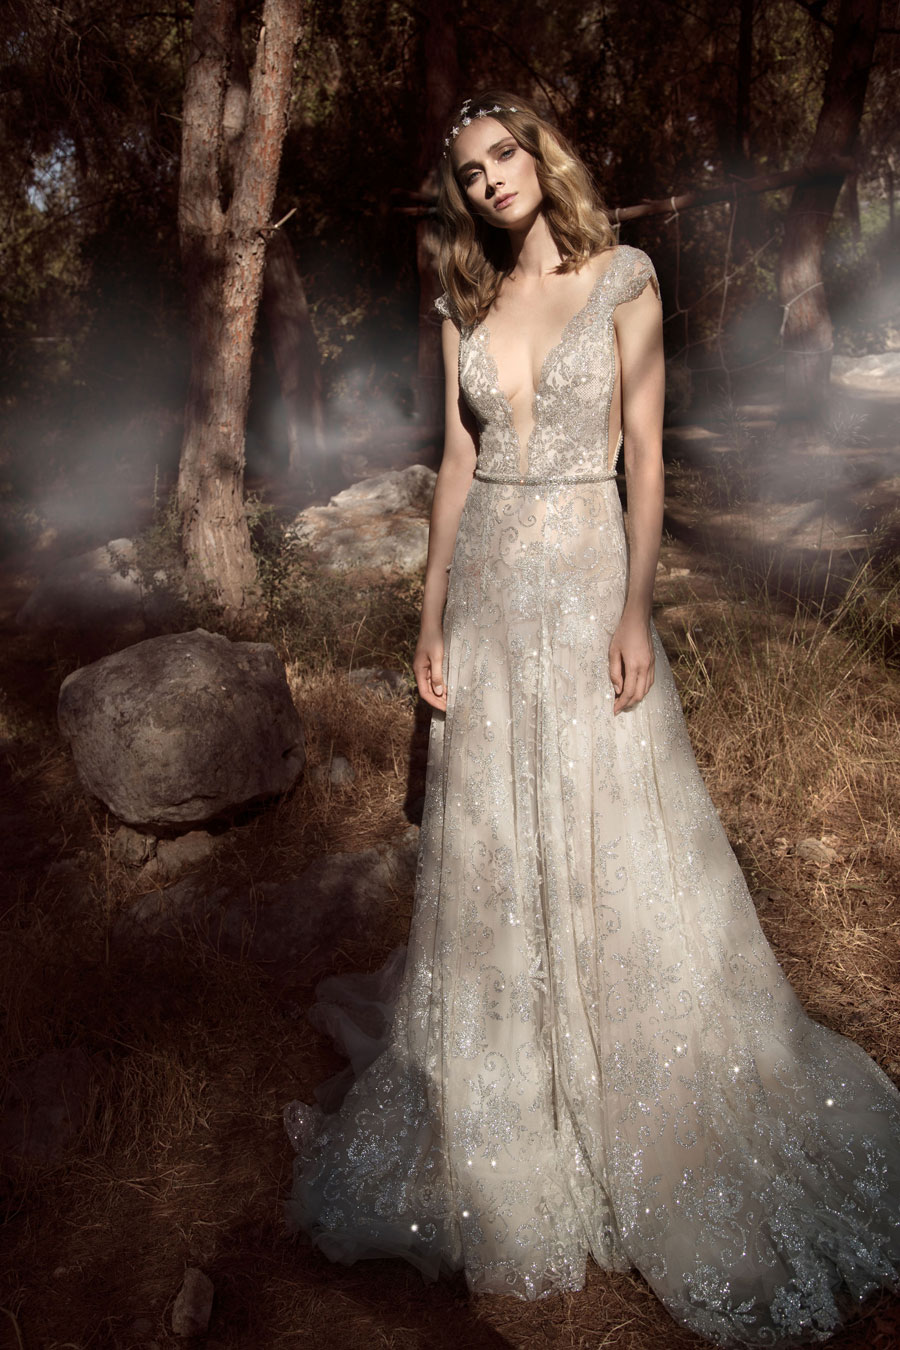 Wedding Dresses for the Urban-Boho Bride- Gala Collection No. IV0010